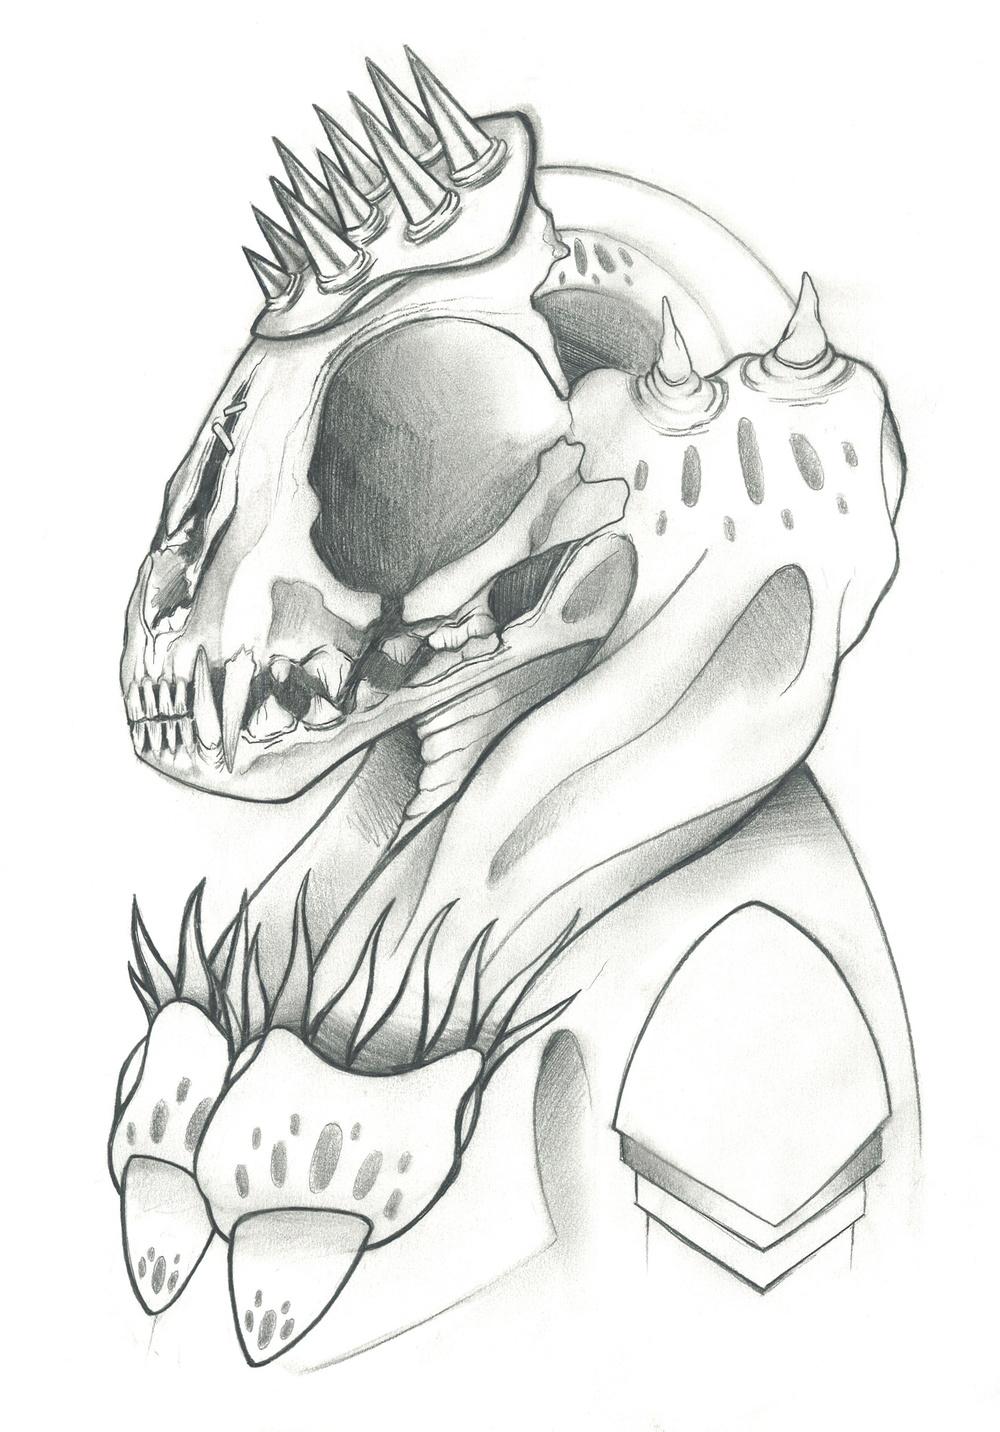 Sketch Study 10